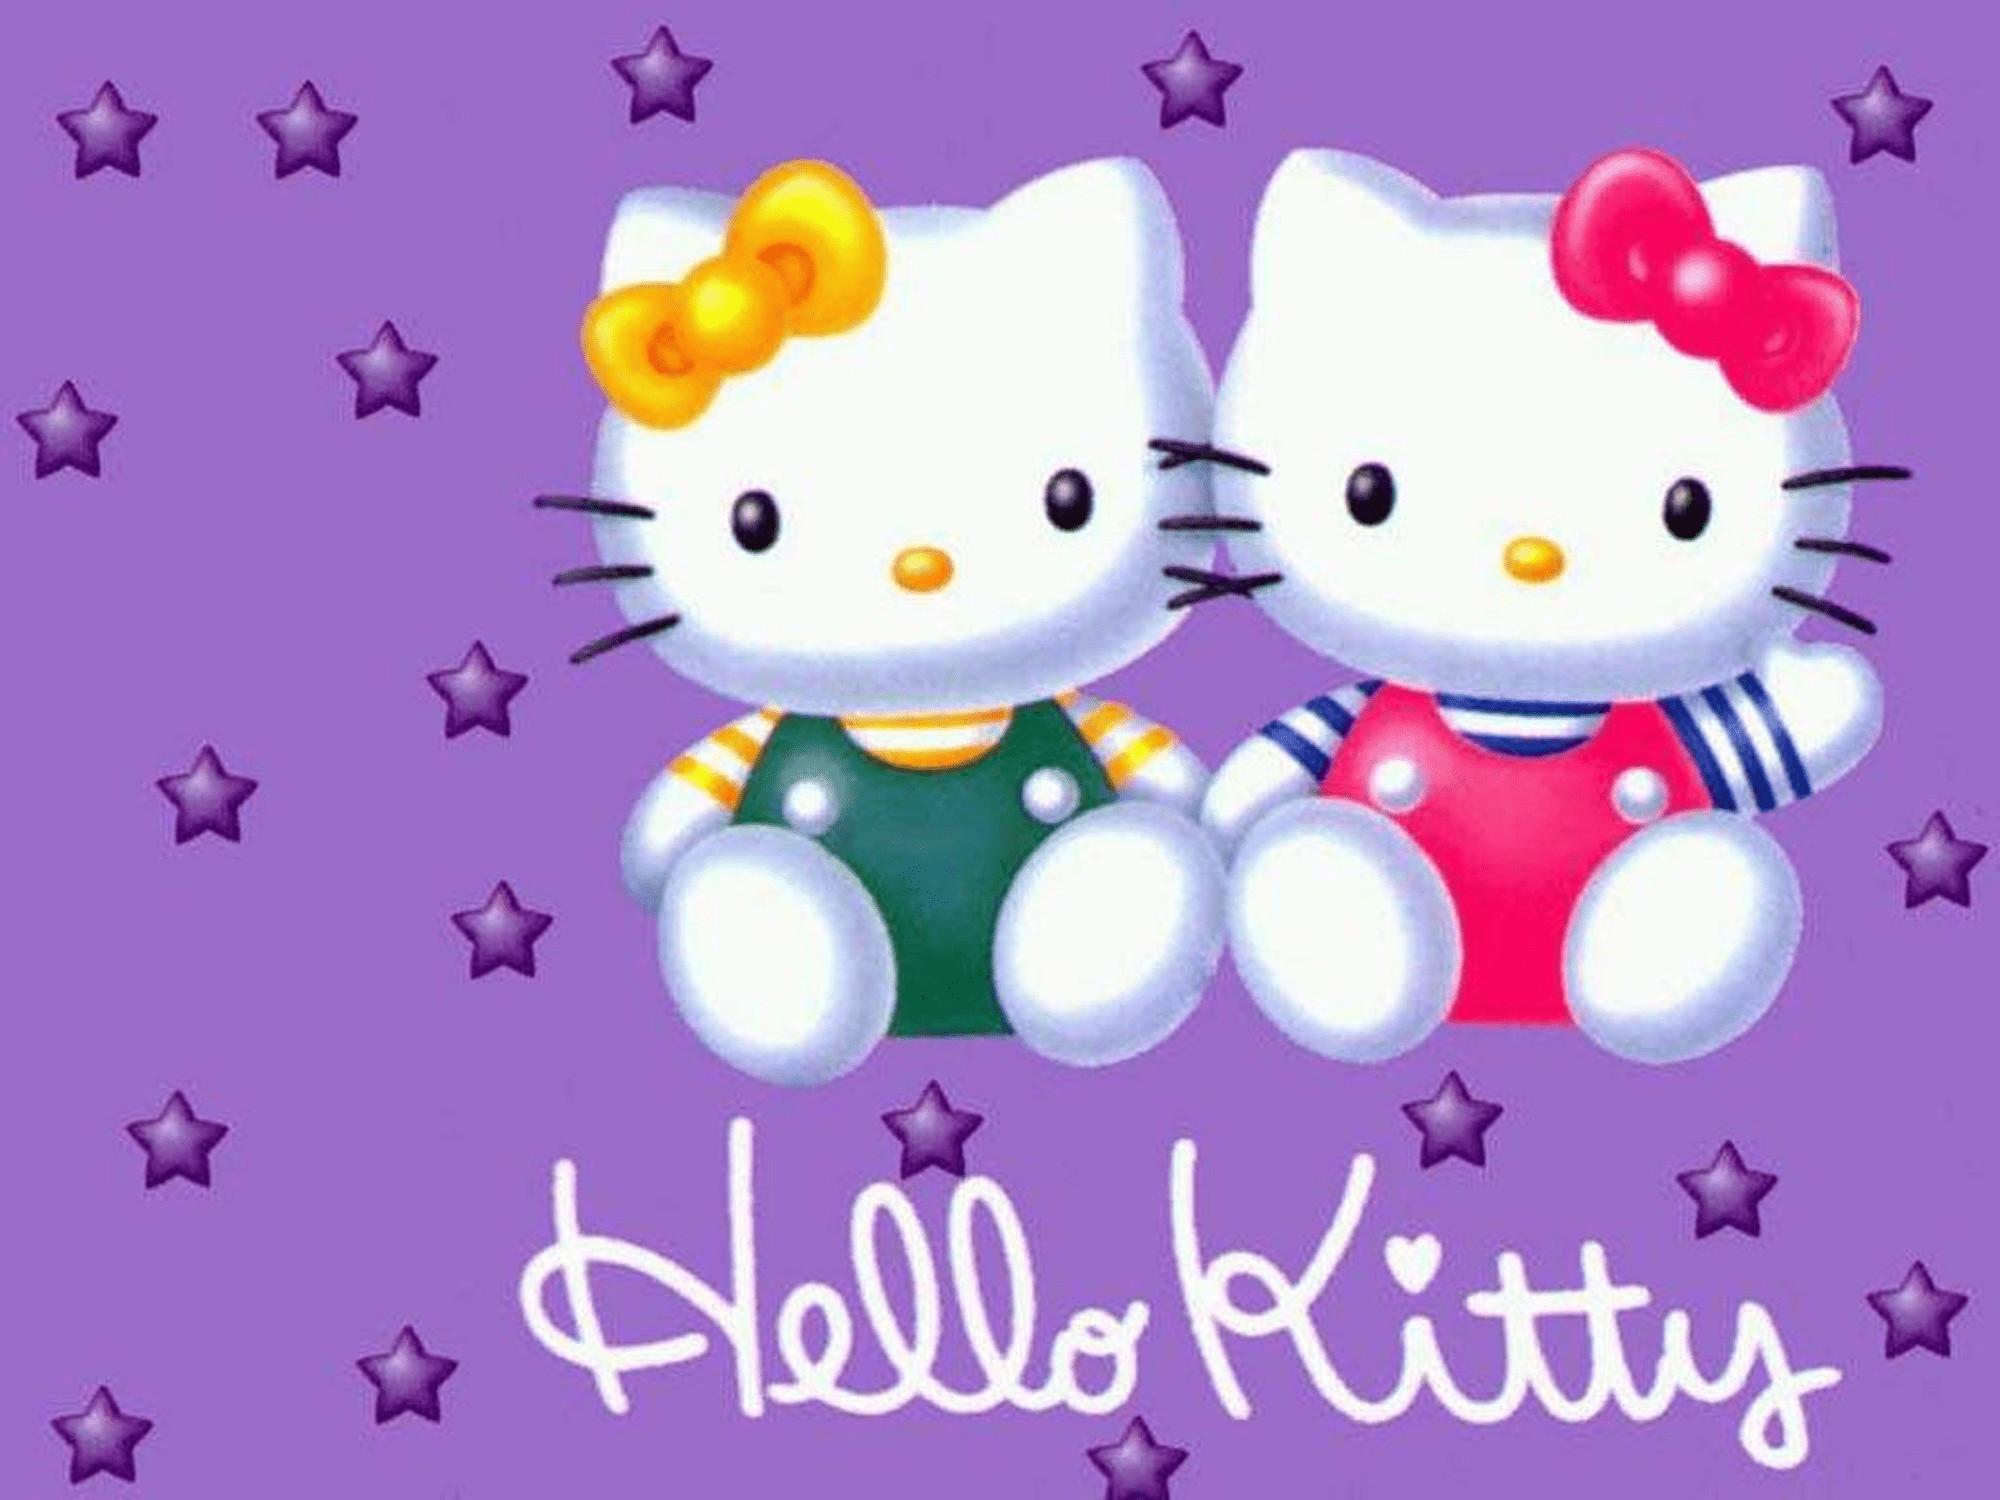 Cute hello kitty wallpaper 55 images - Wallpaper hello kitty full hd ...